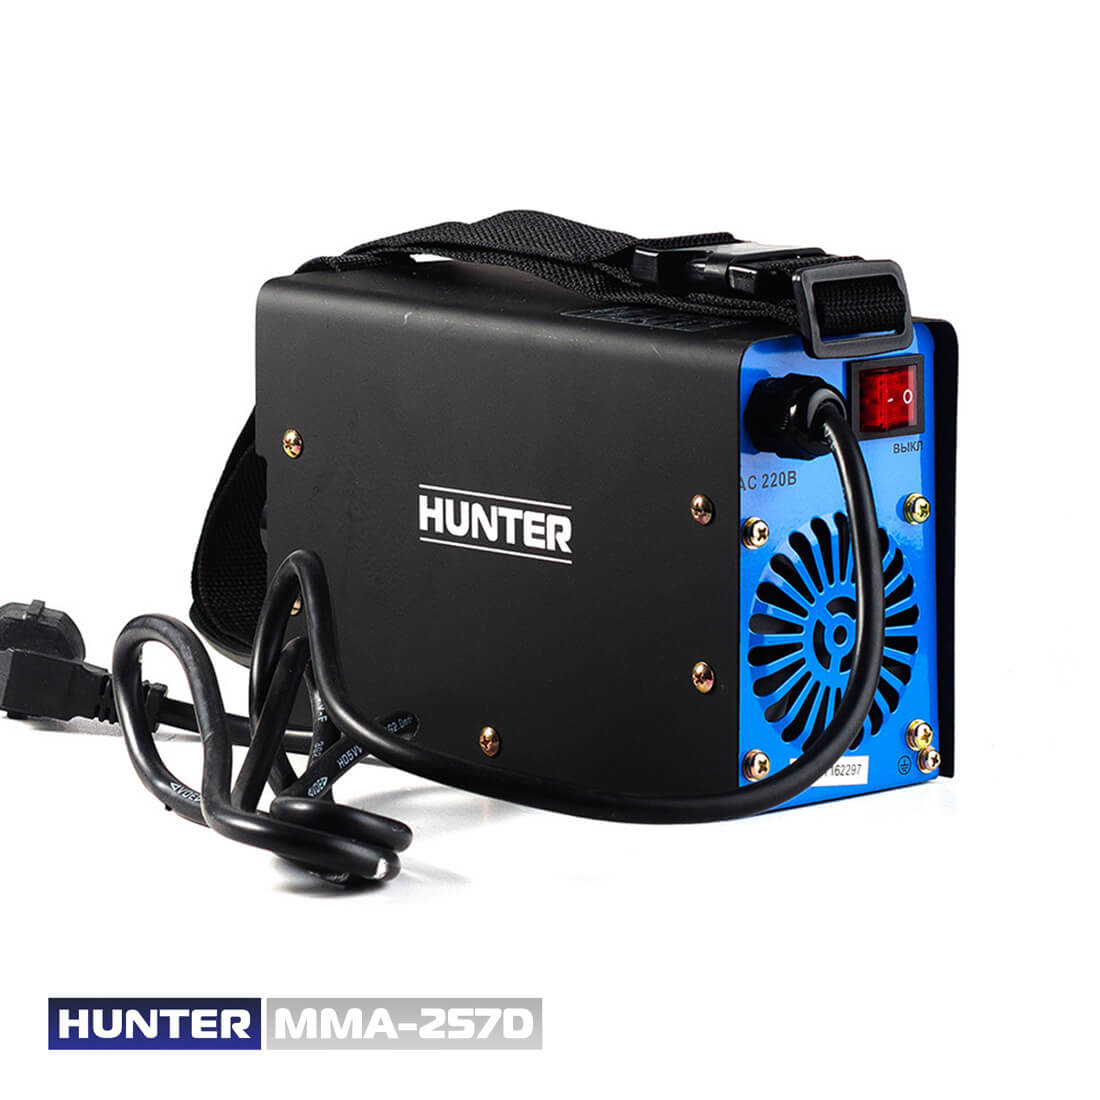 Фото Hunter MMA 257D (дуговий) цена 2250грн №4 — Hunter